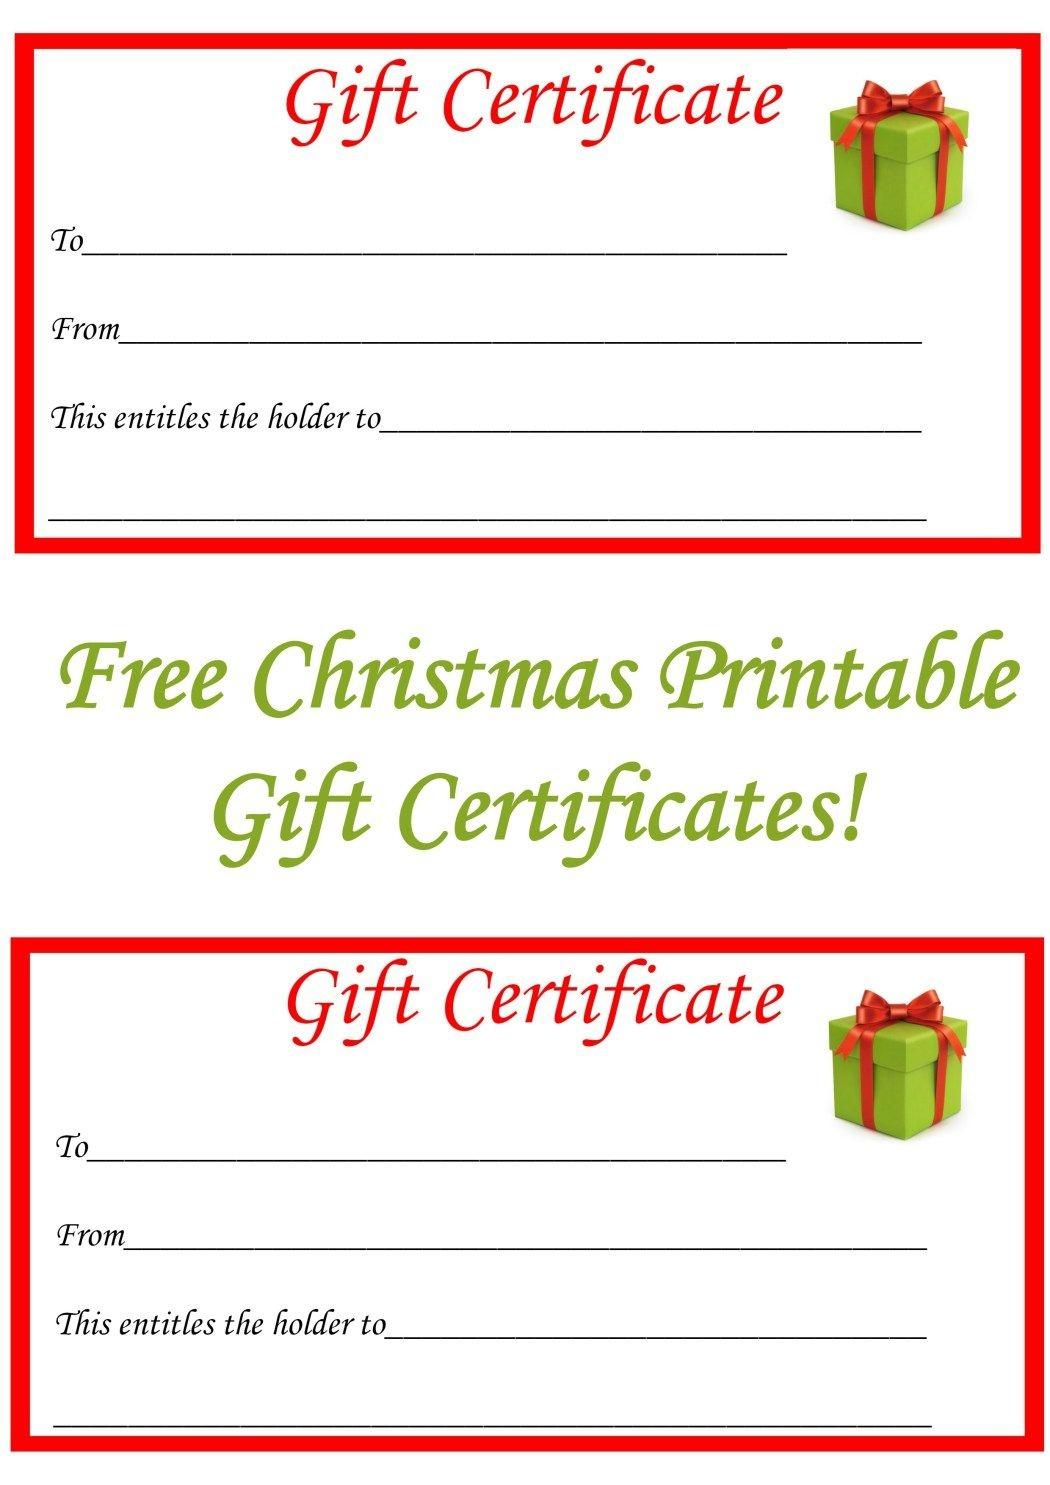 Free Christmas Printable Gift Certificates   Gift Ideas   Christmas - Free Printable Christmas Gift Cards